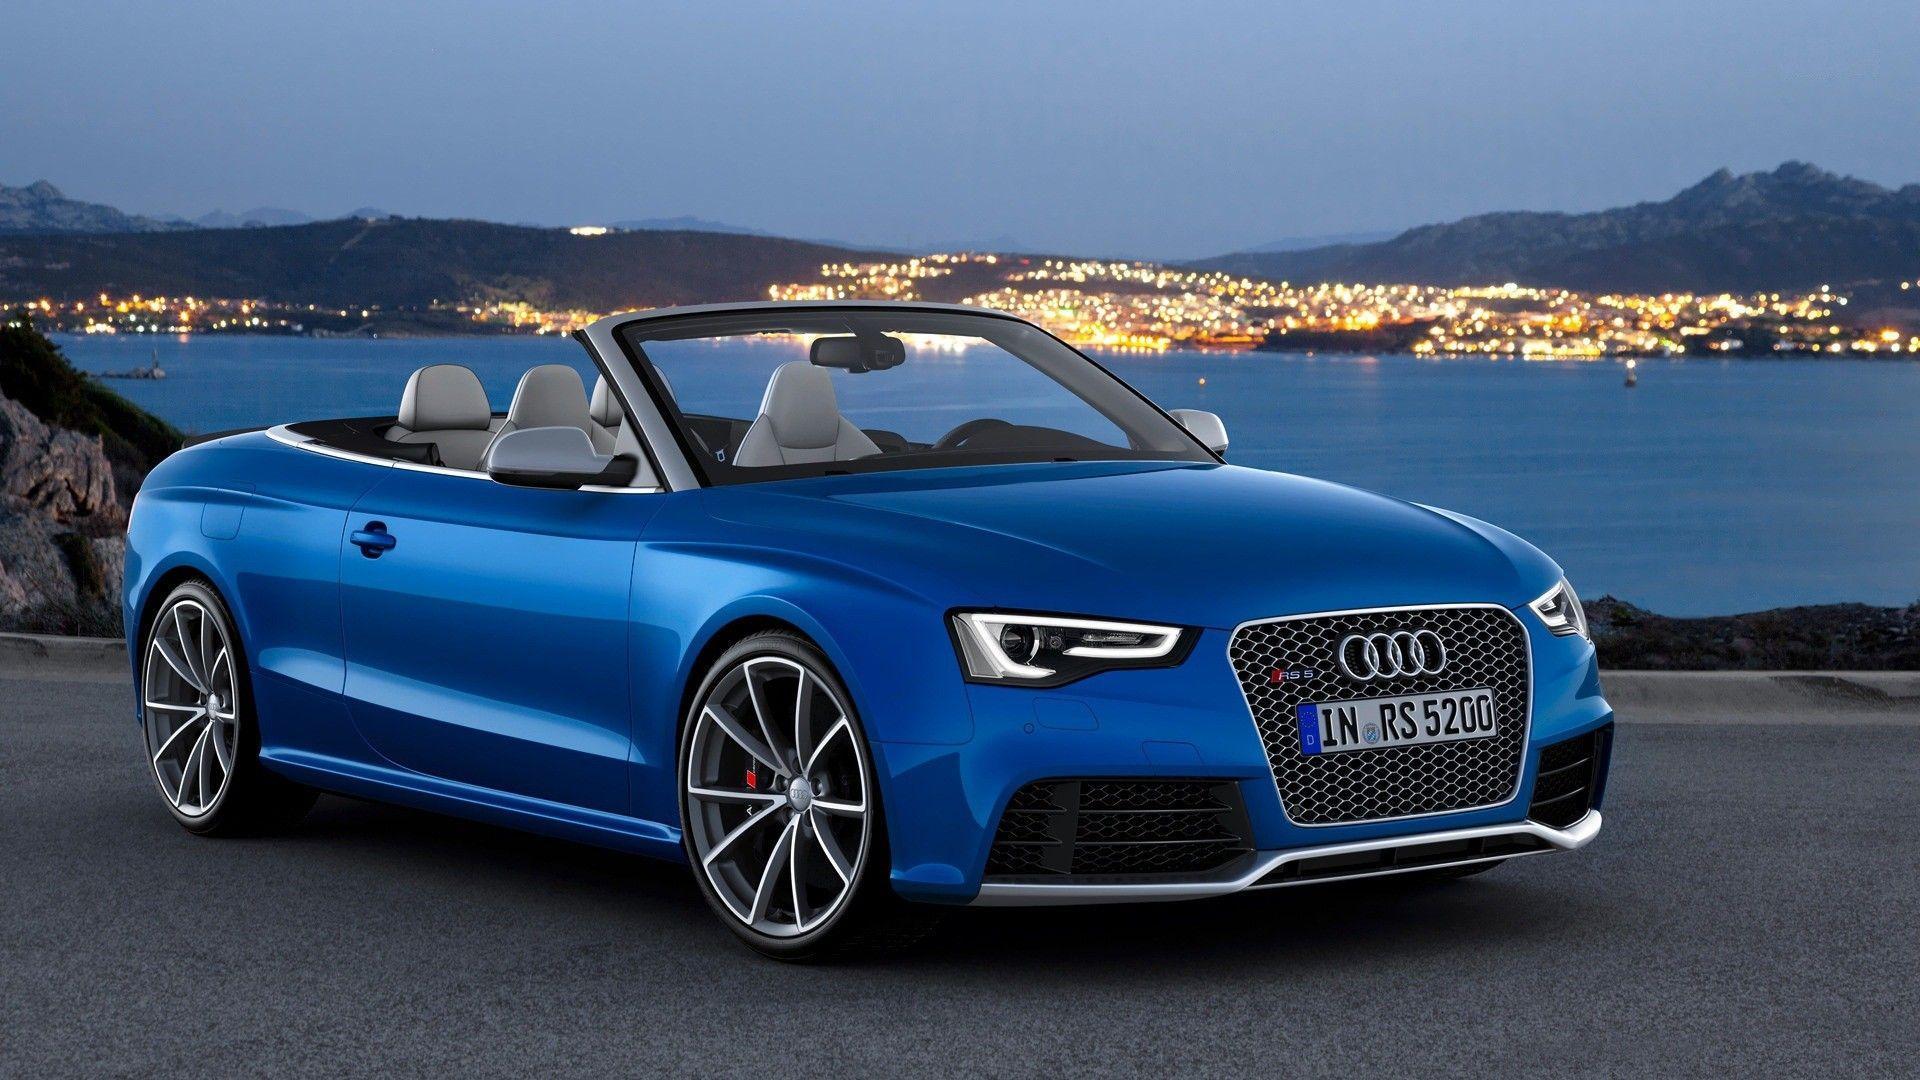 Beautiful Blue Audi Car At Sunset Hd Auto Wallpaper Audi Cars